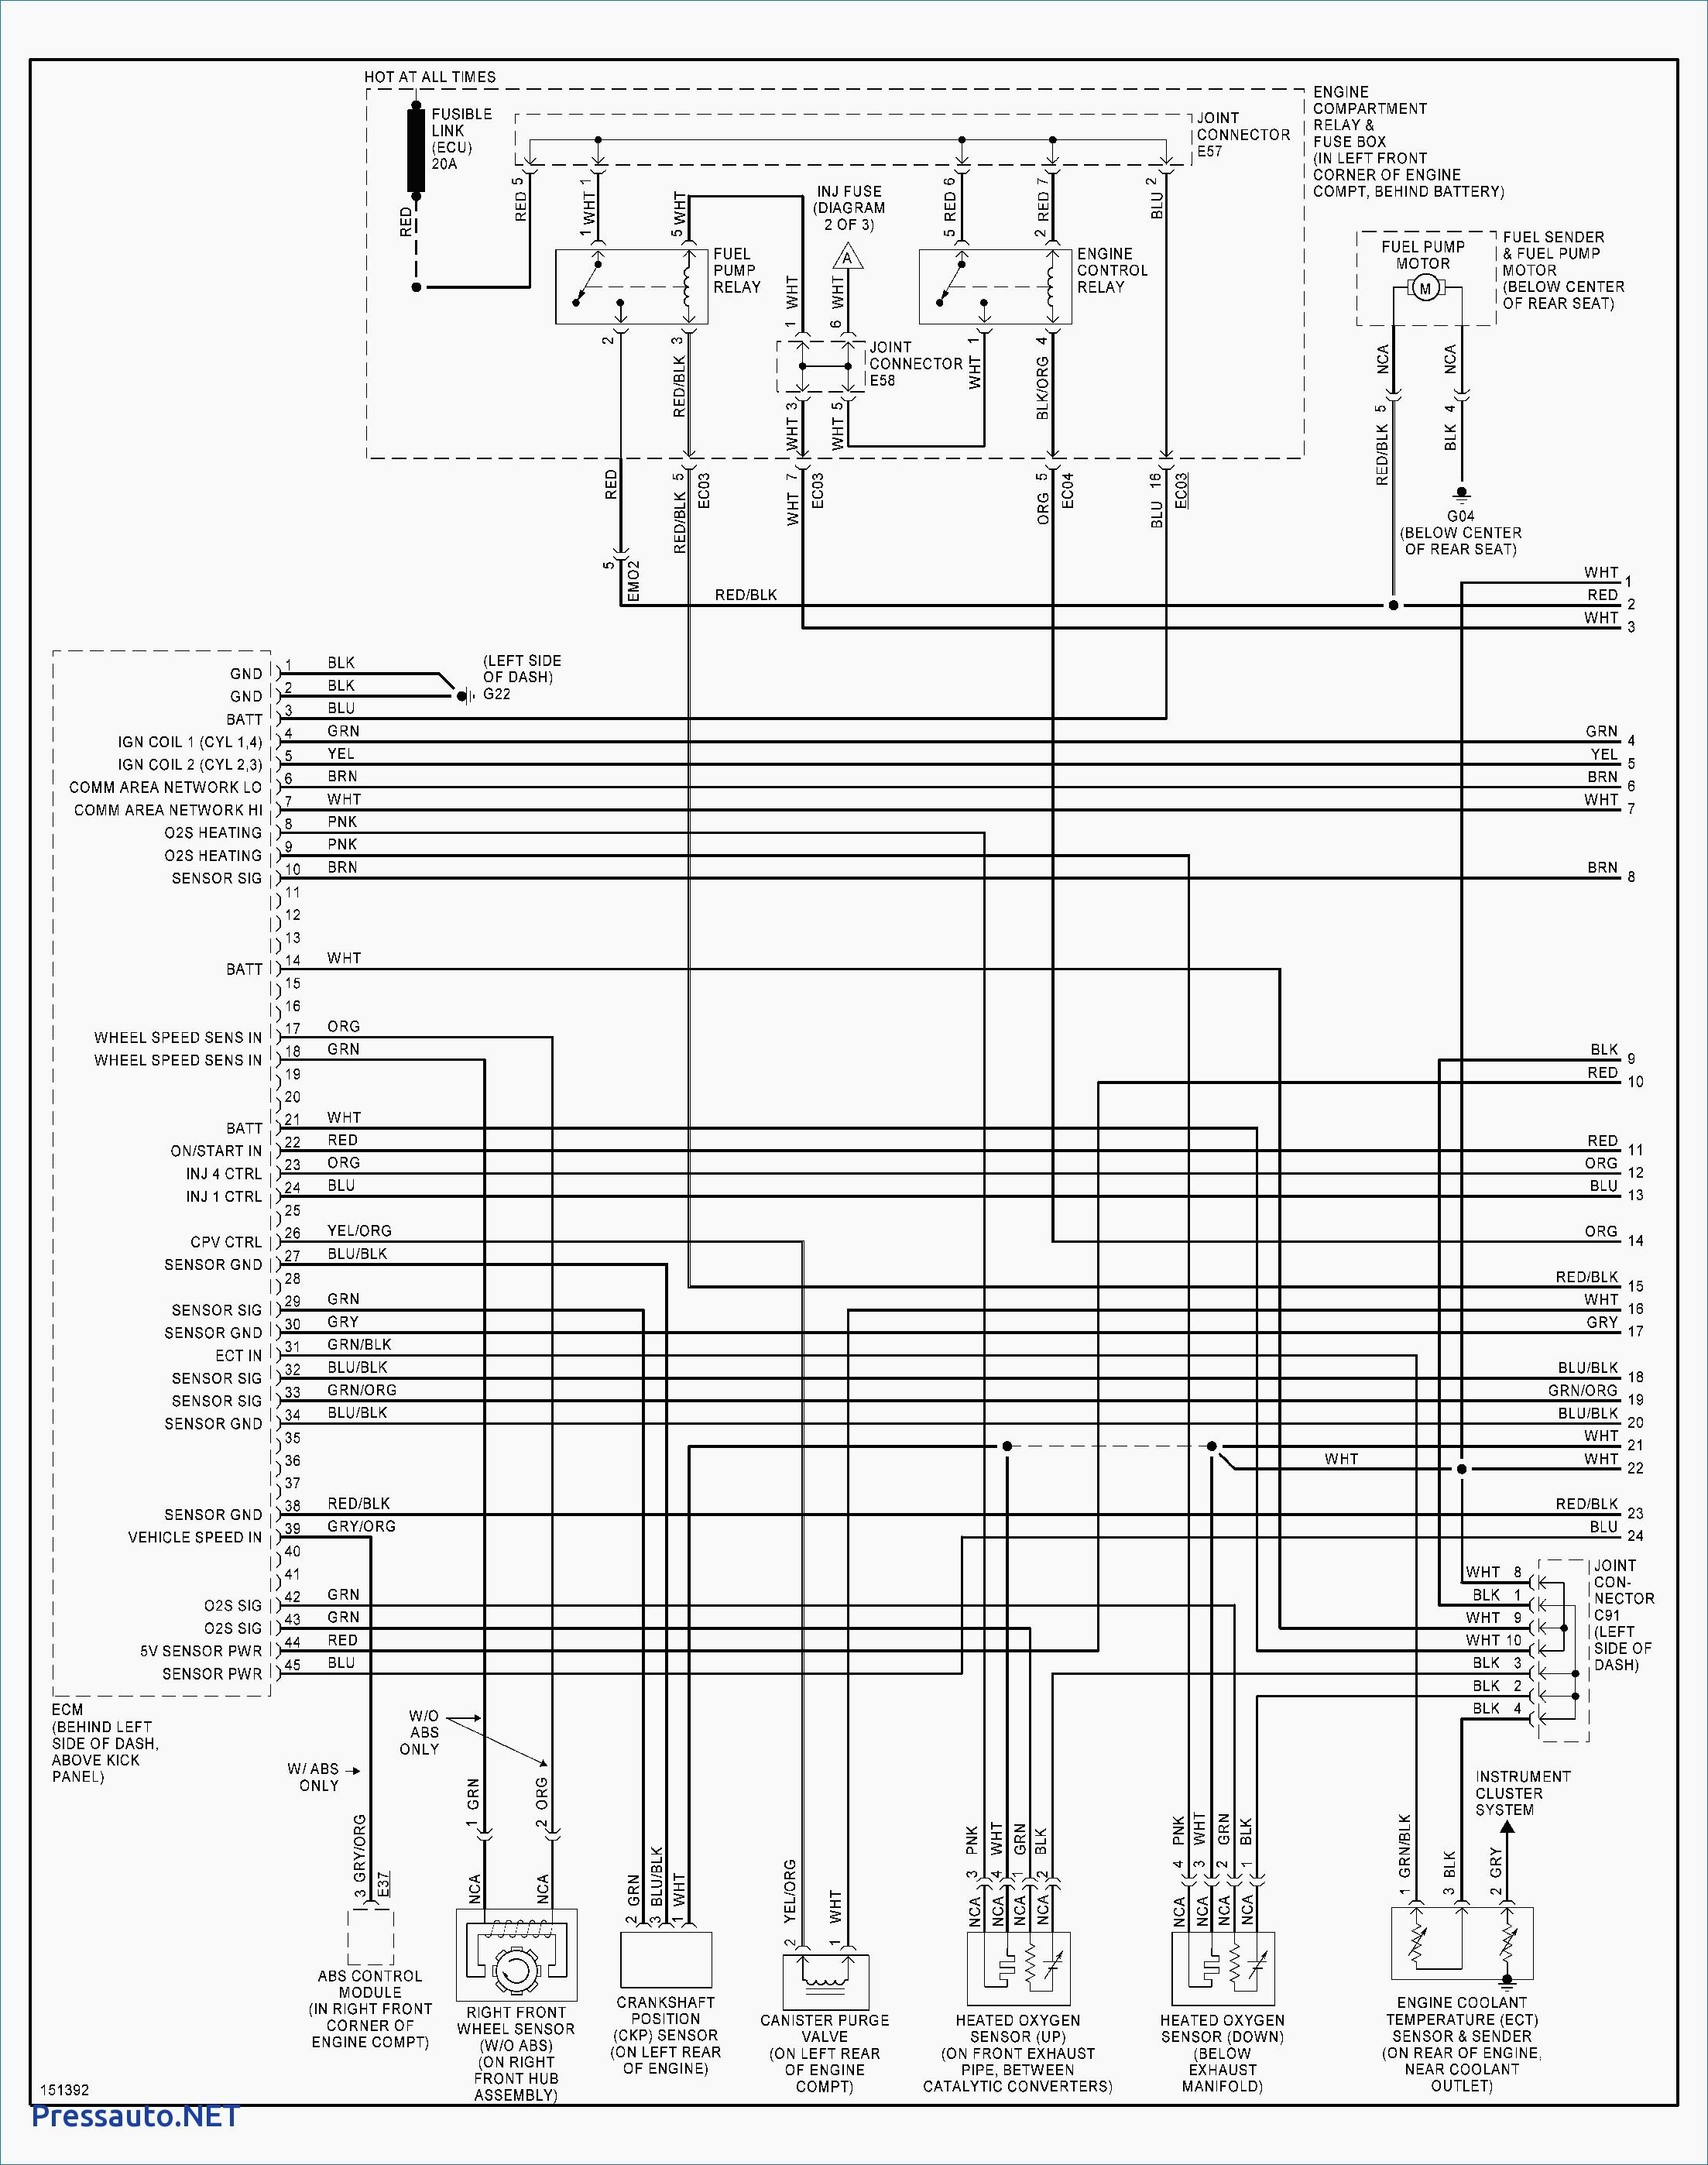 santa fe 2004 engine electrical diagram wiring schematics. Black Bedroom Furniture Sets. Home Design Ideas